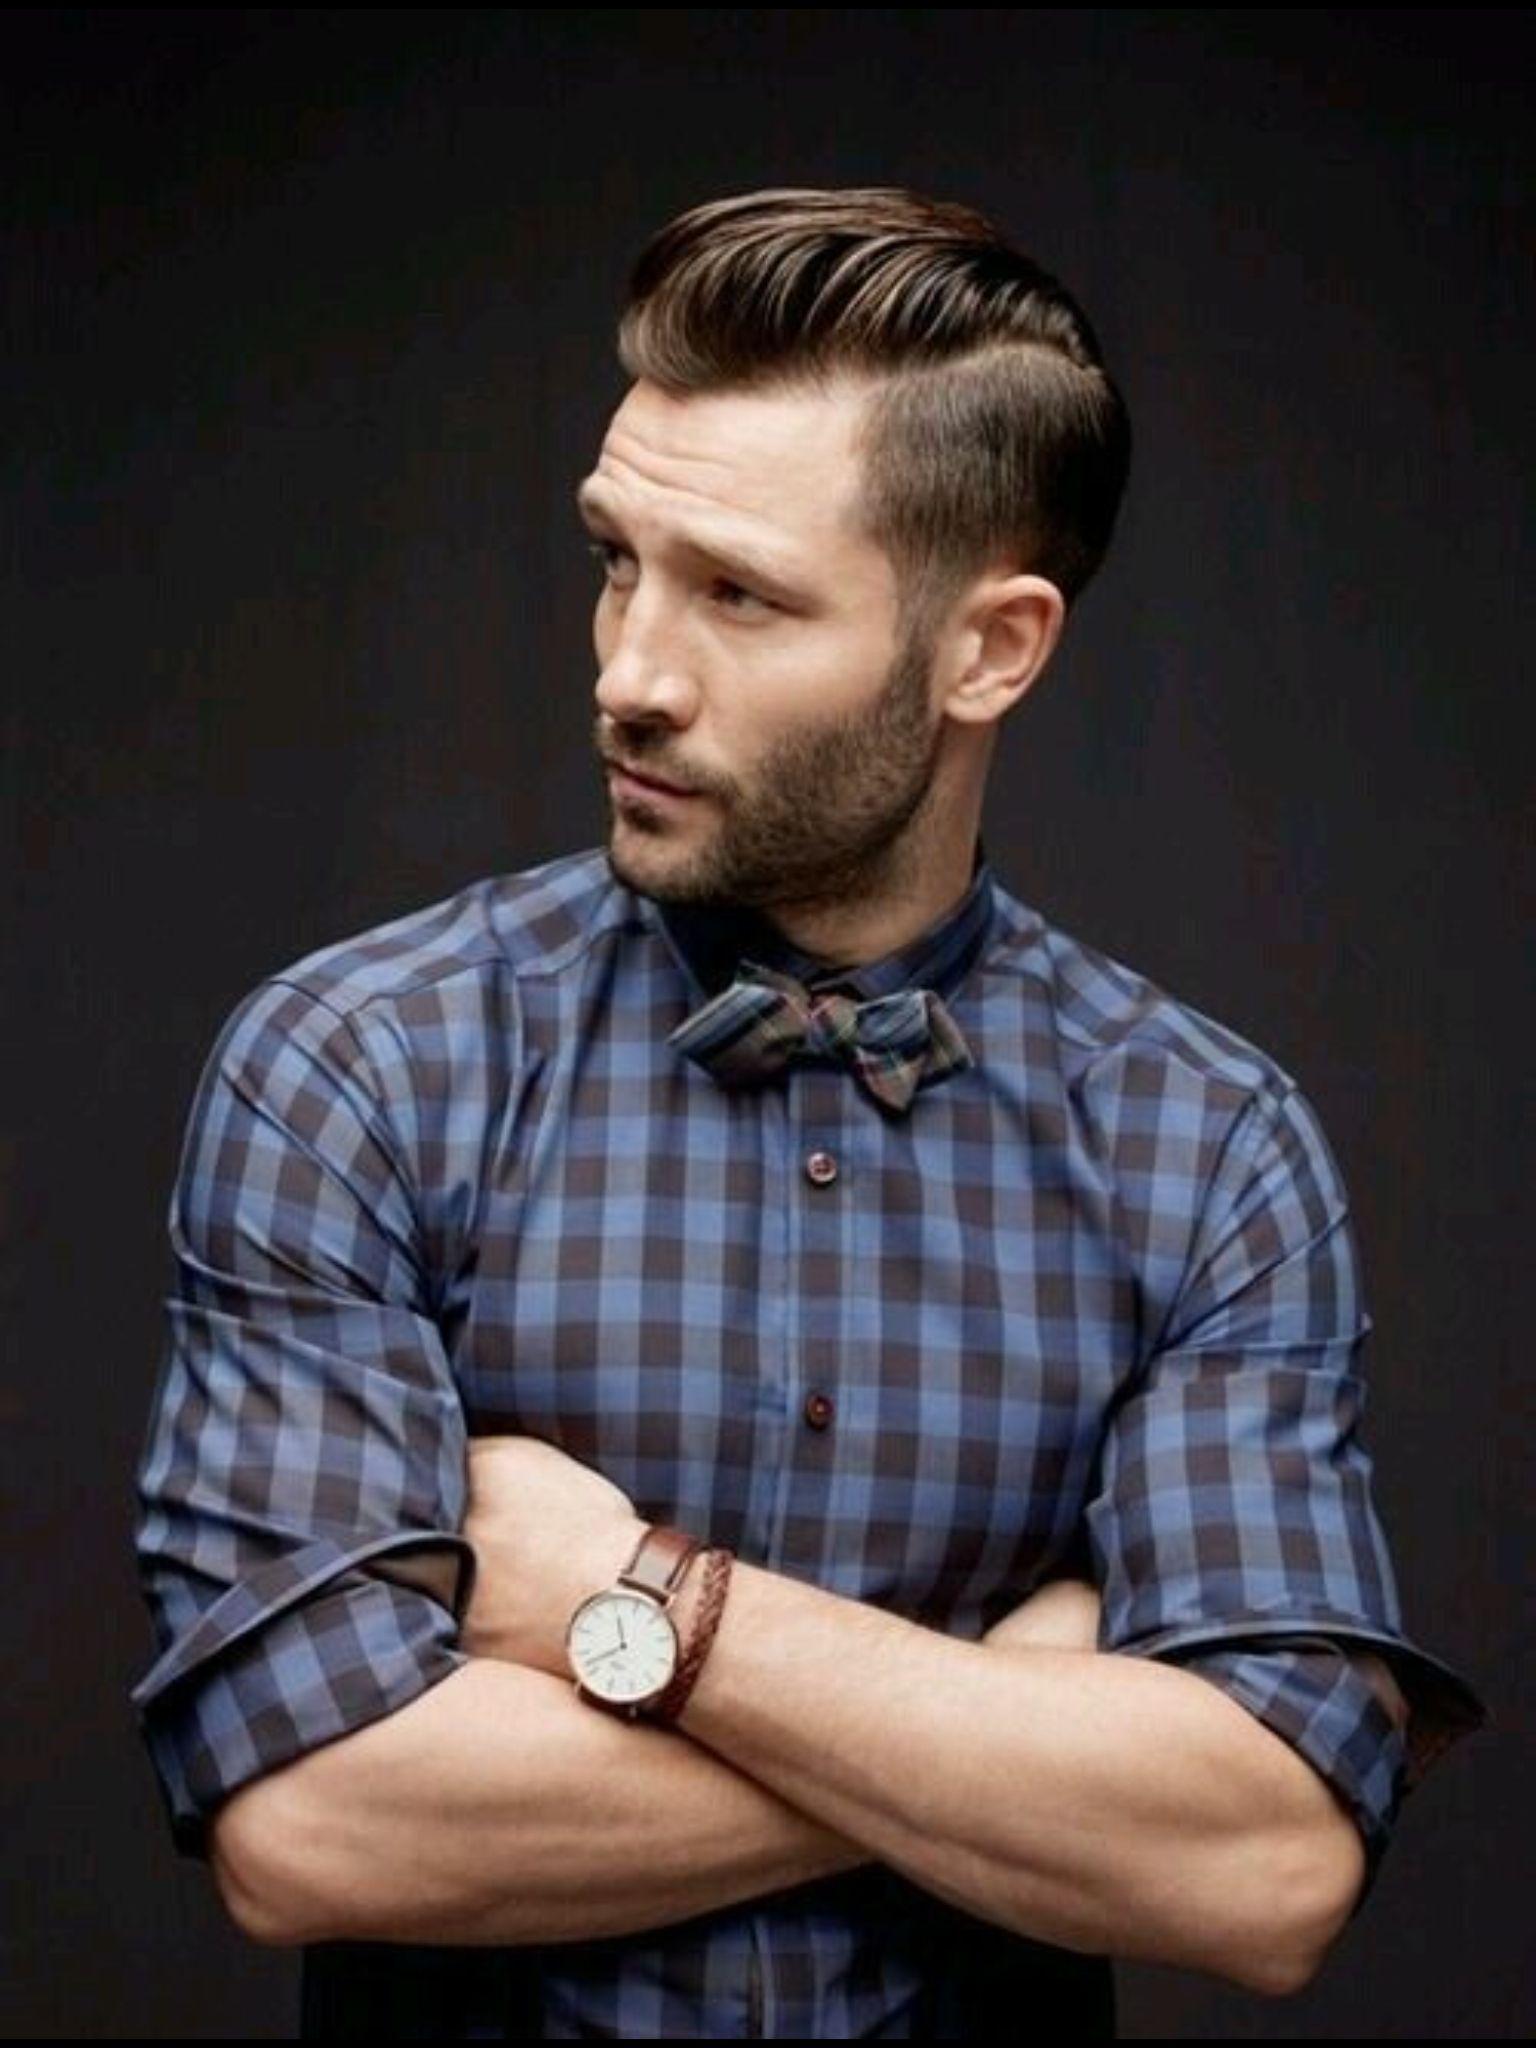 Haircuts for men las vegas menus wear  fashion for men  mode homme  stylers  pinterest